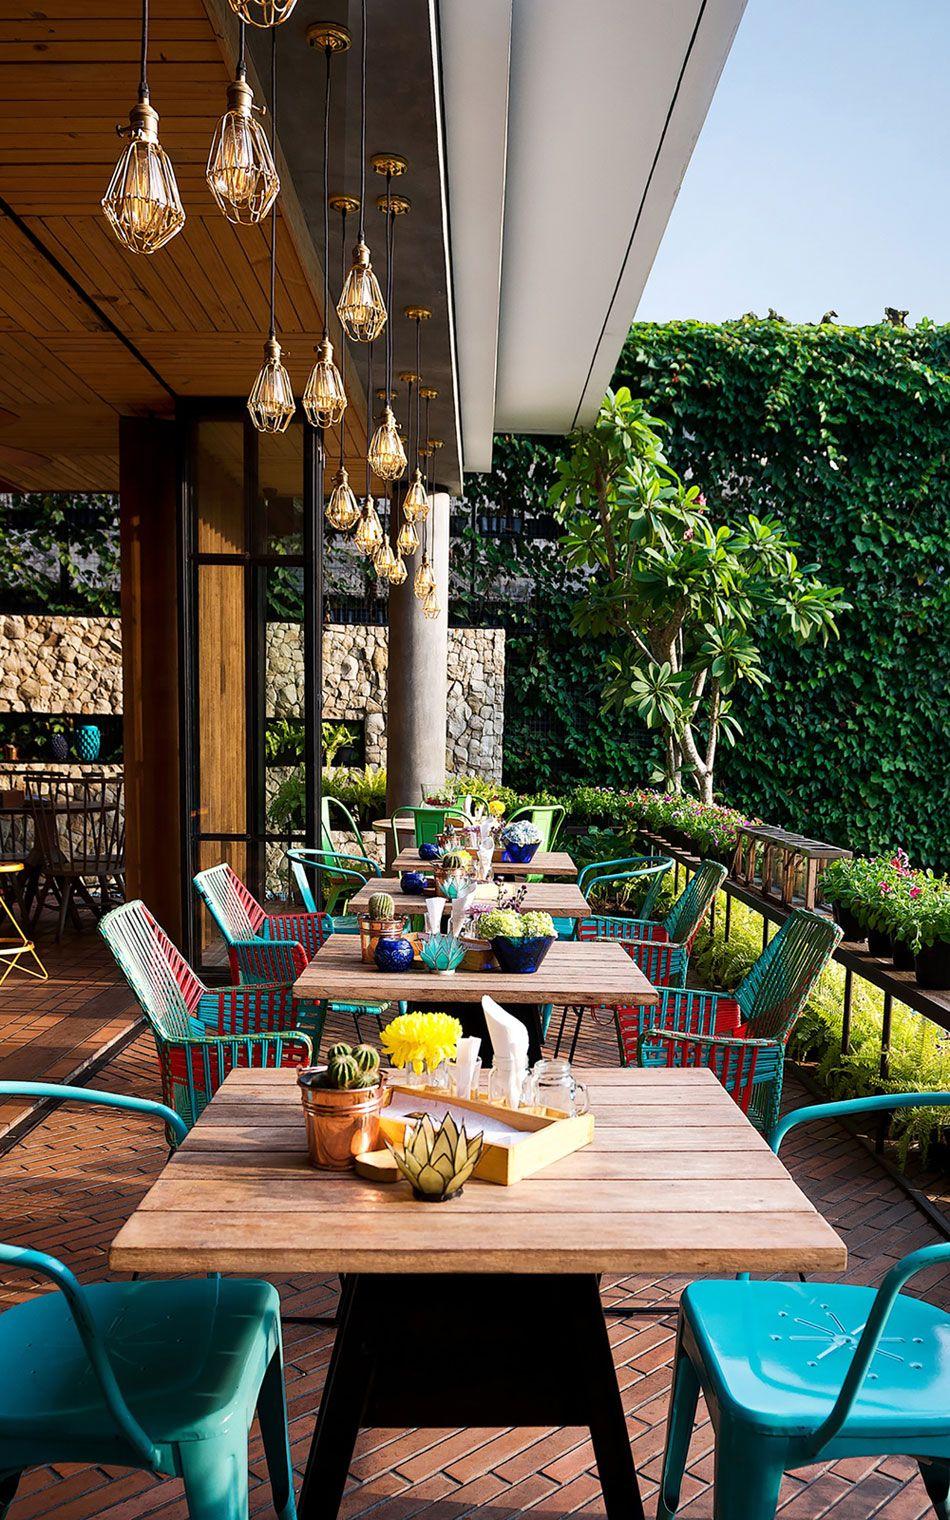 Mezzanine Cafe Outdoor